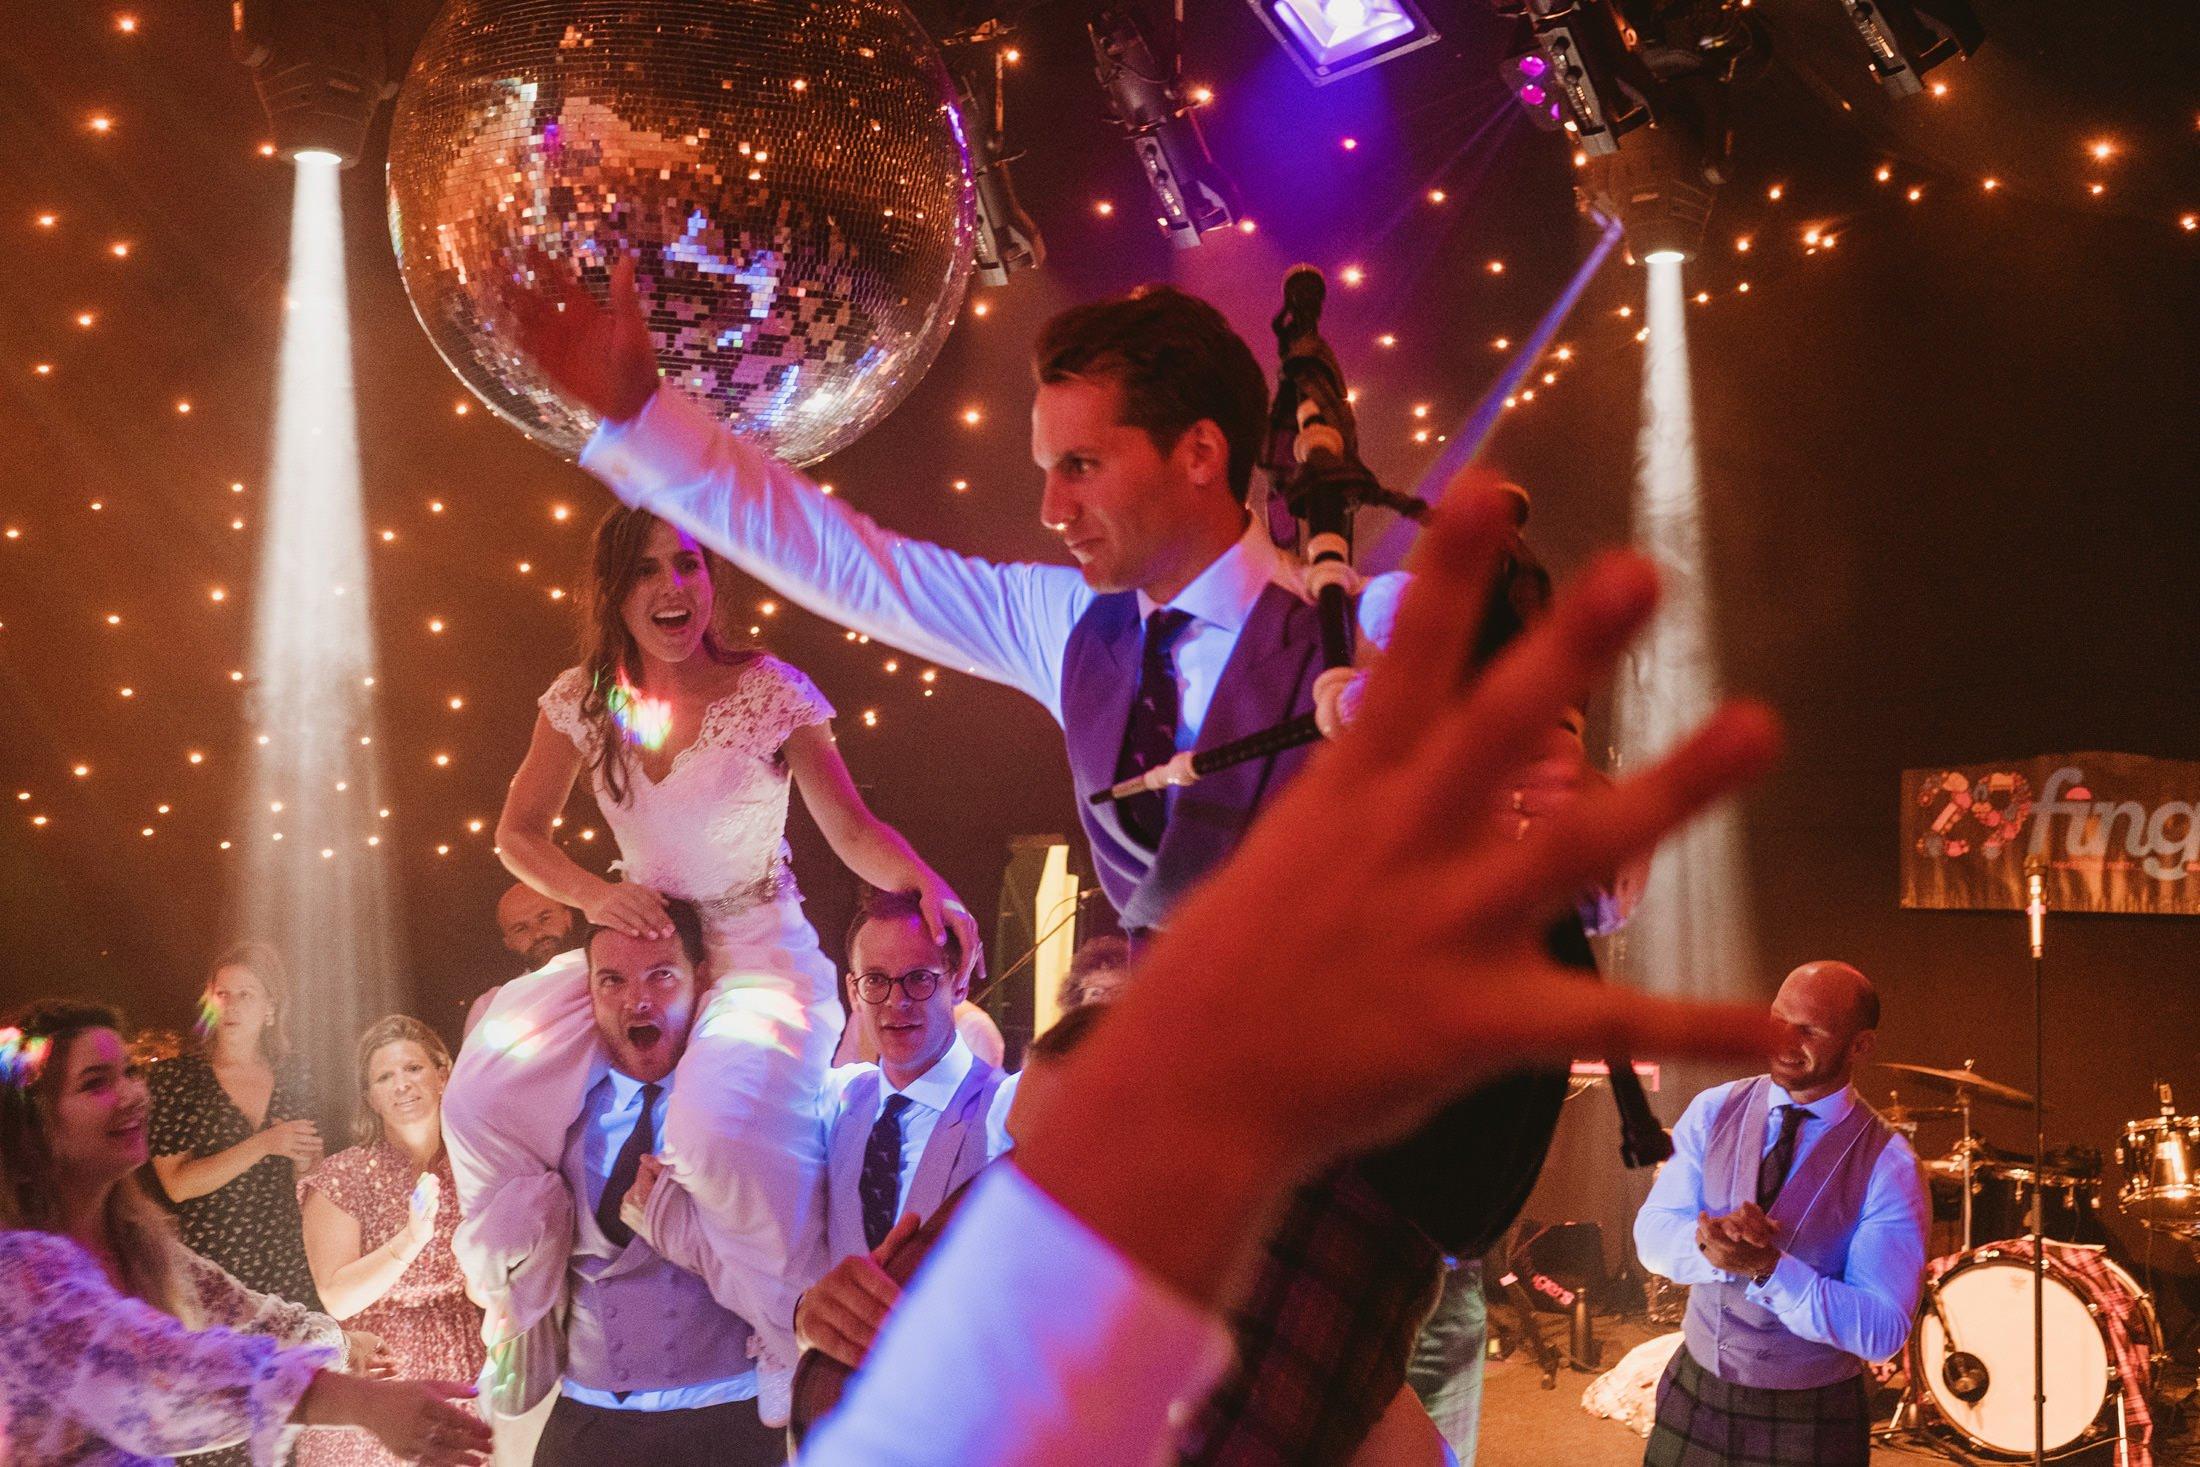 groom and bride on the dance floor